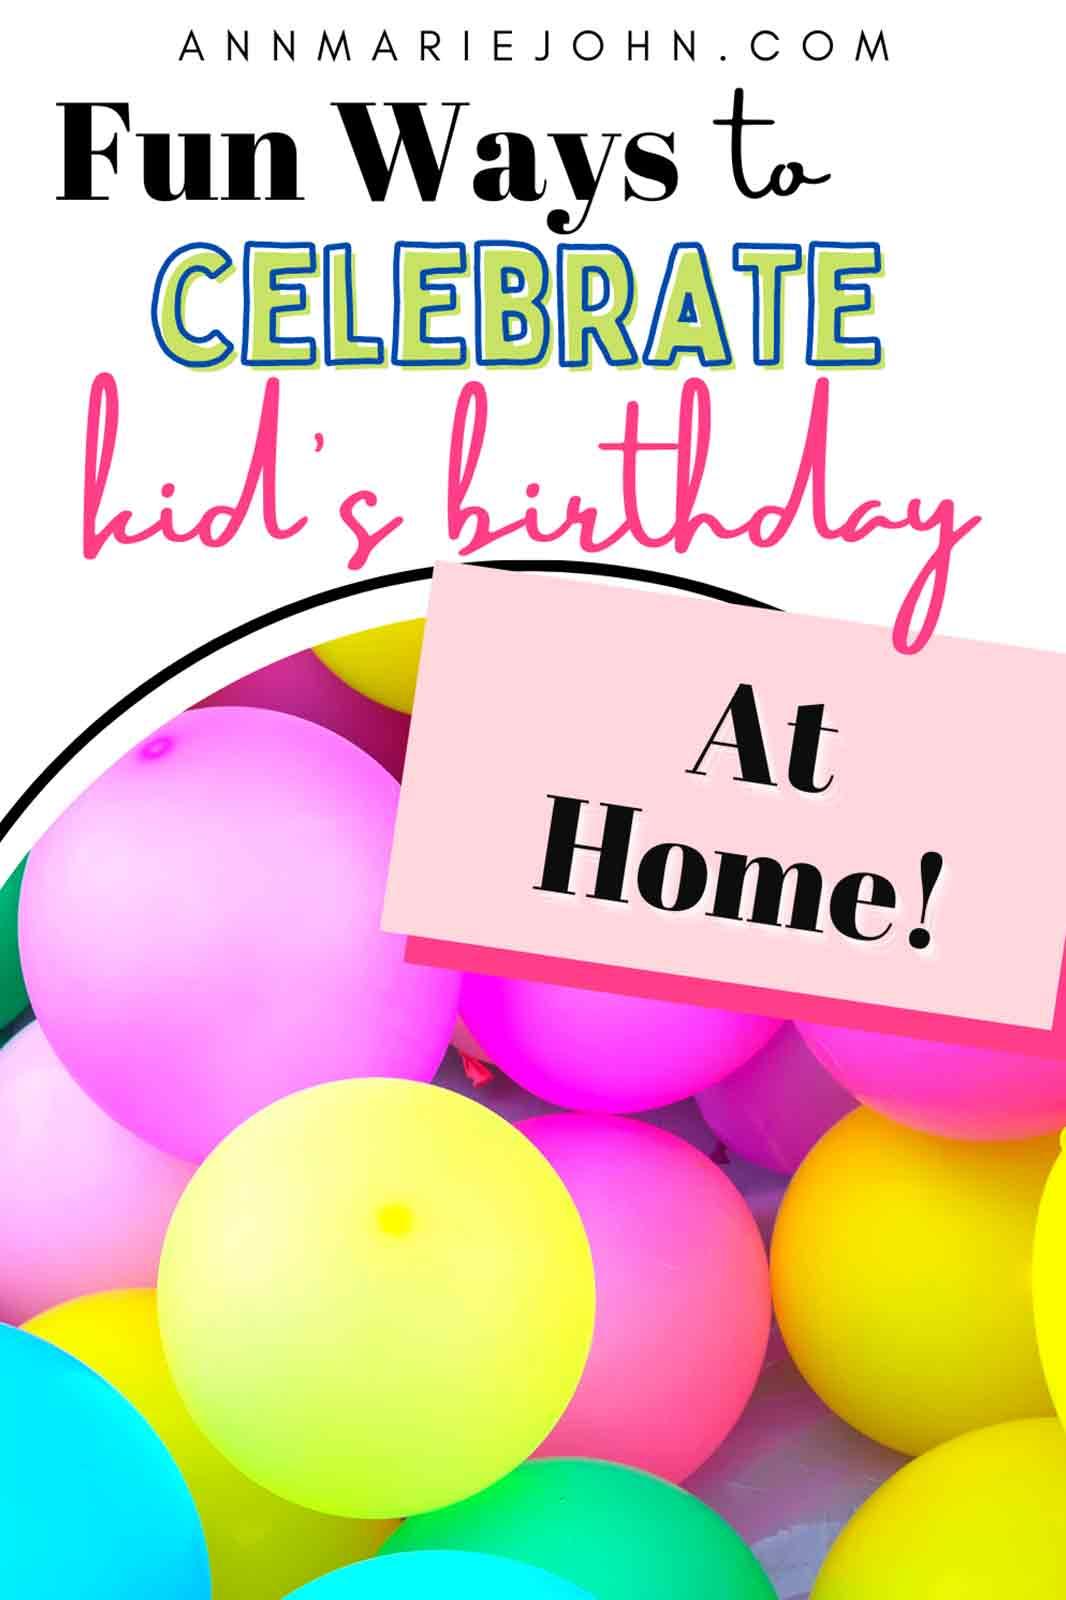 Fun Ways to Celebrate Your Kids Birthdays at Home